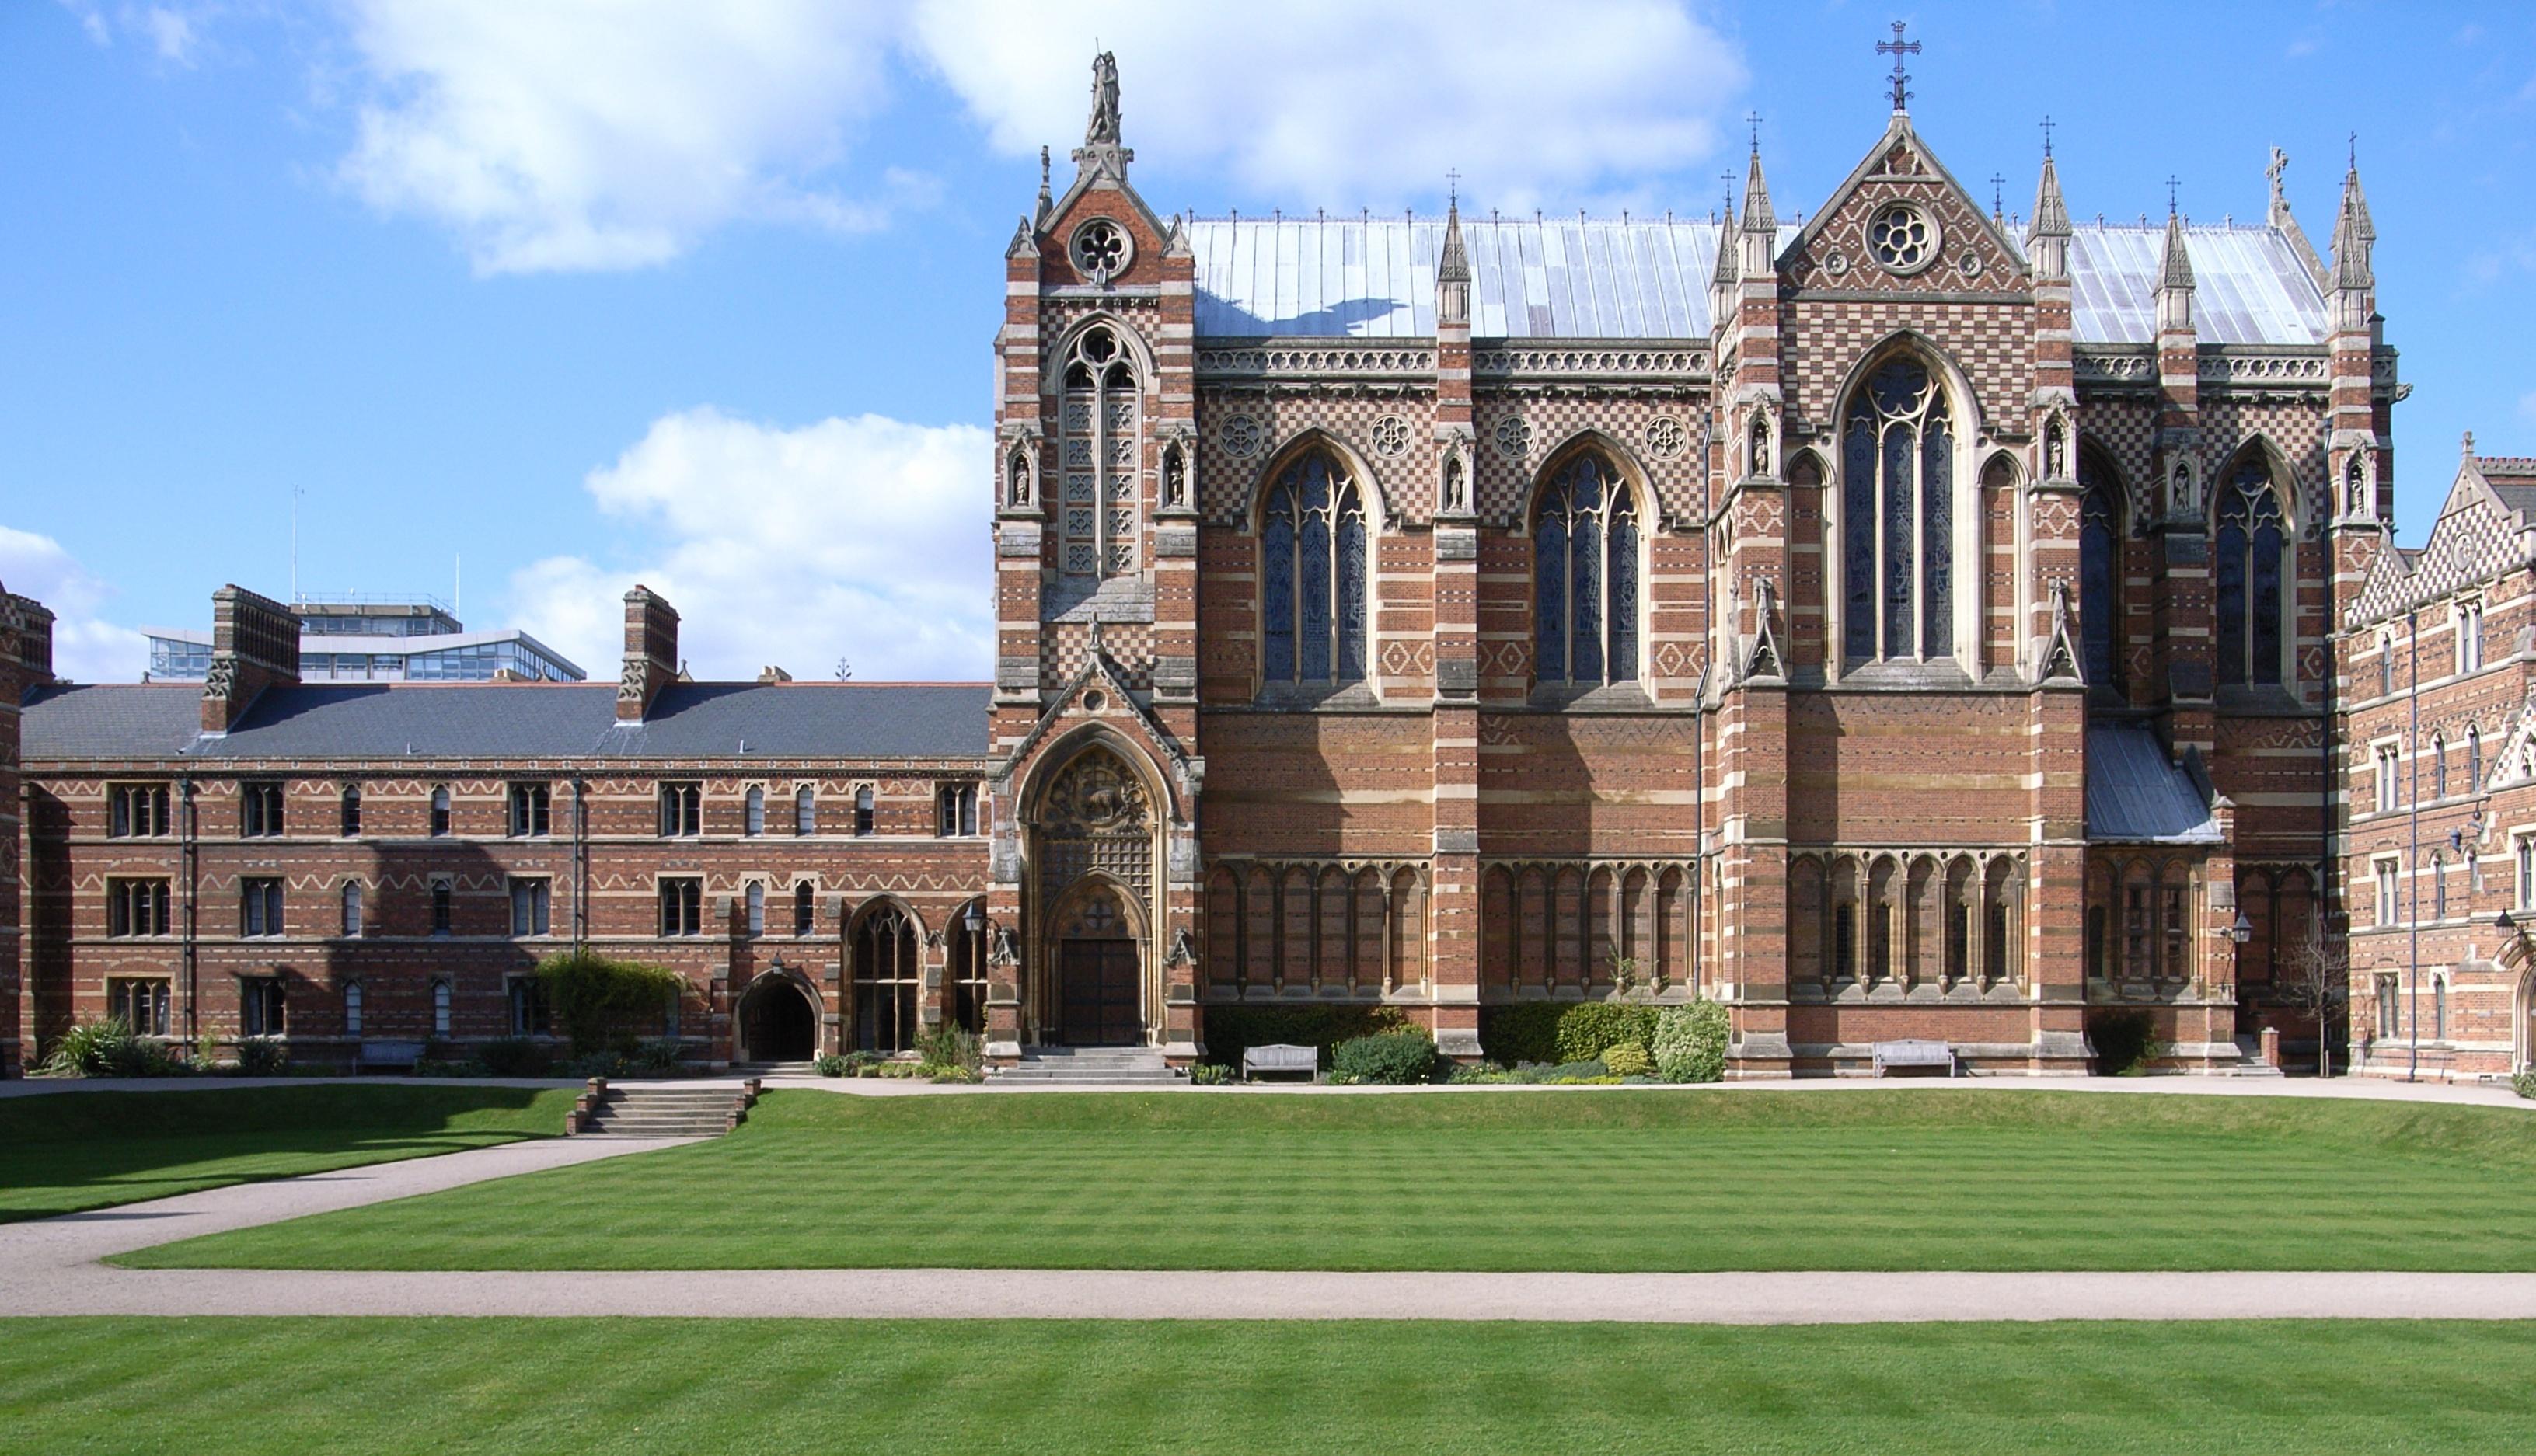 File:Keble College Chapel Oxford.jpg - Wikimedia Commons